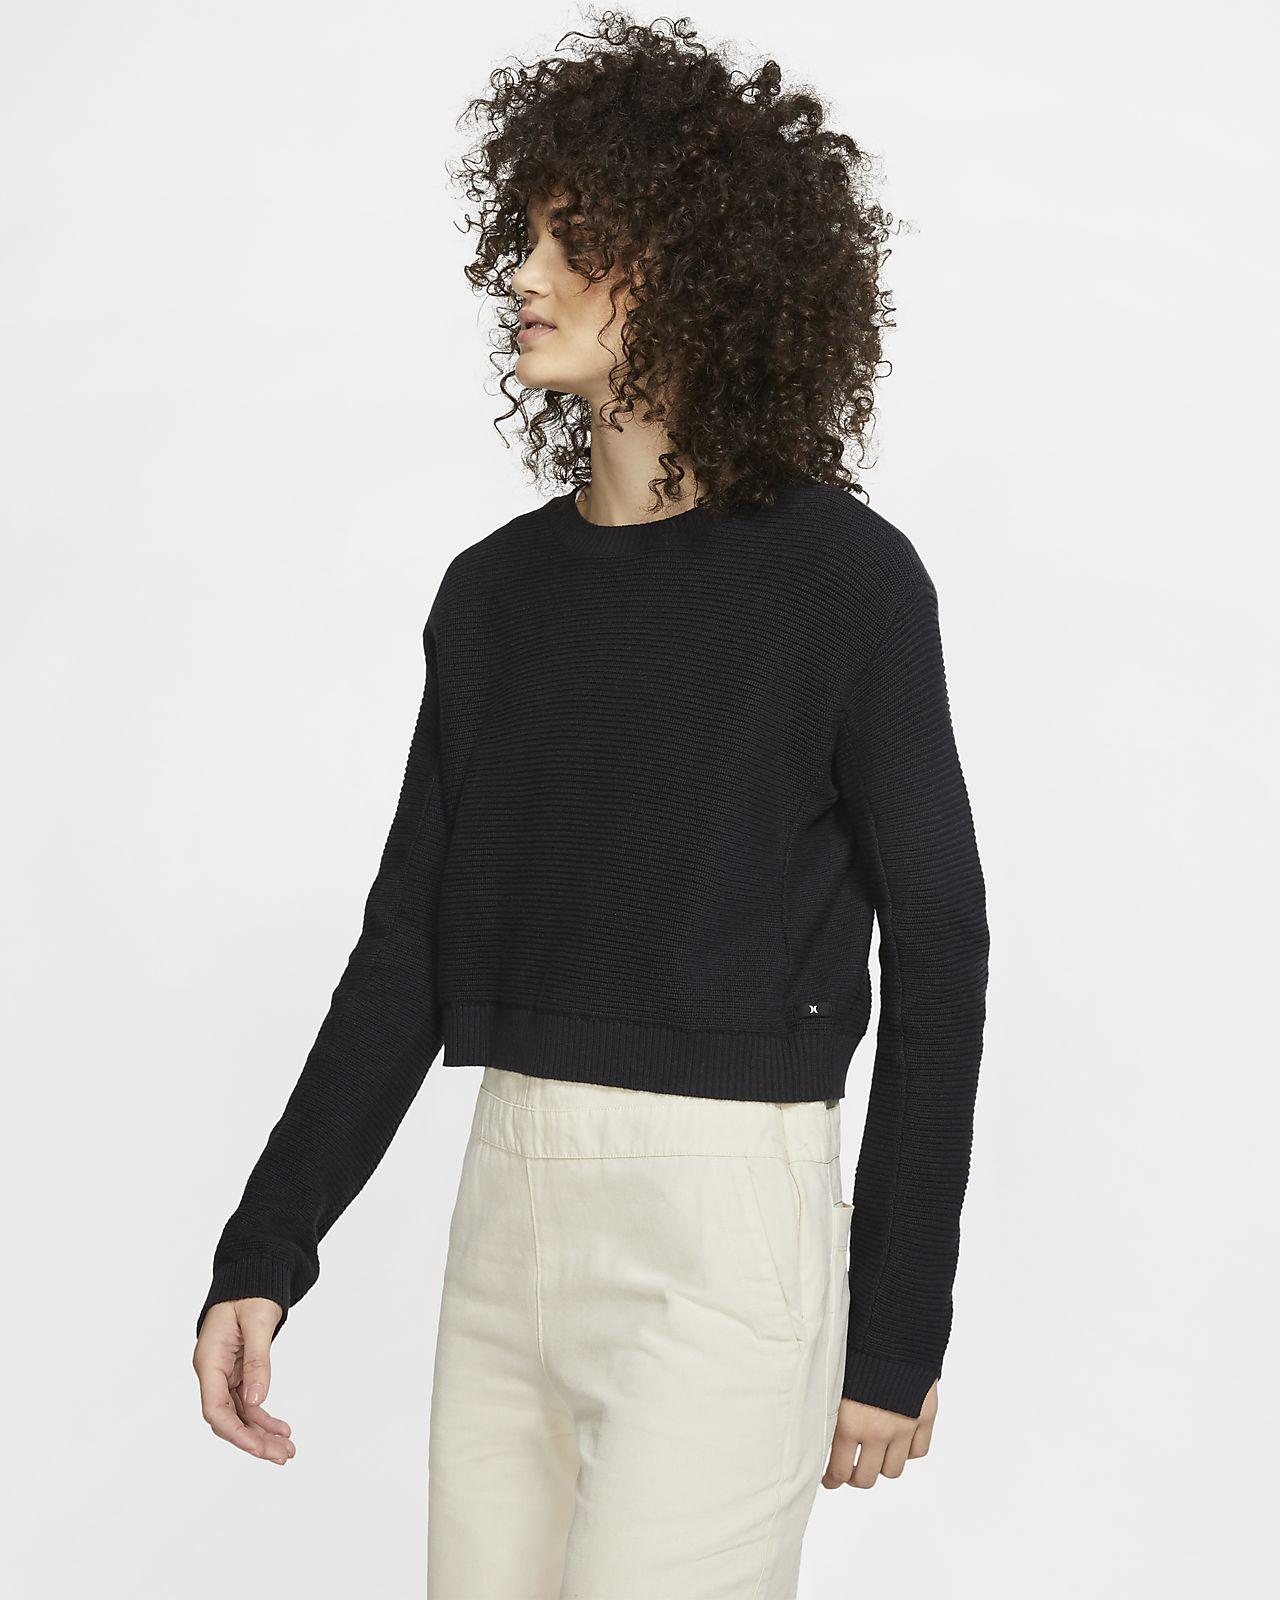 Hurley Sweater Weather Jersei - Dona